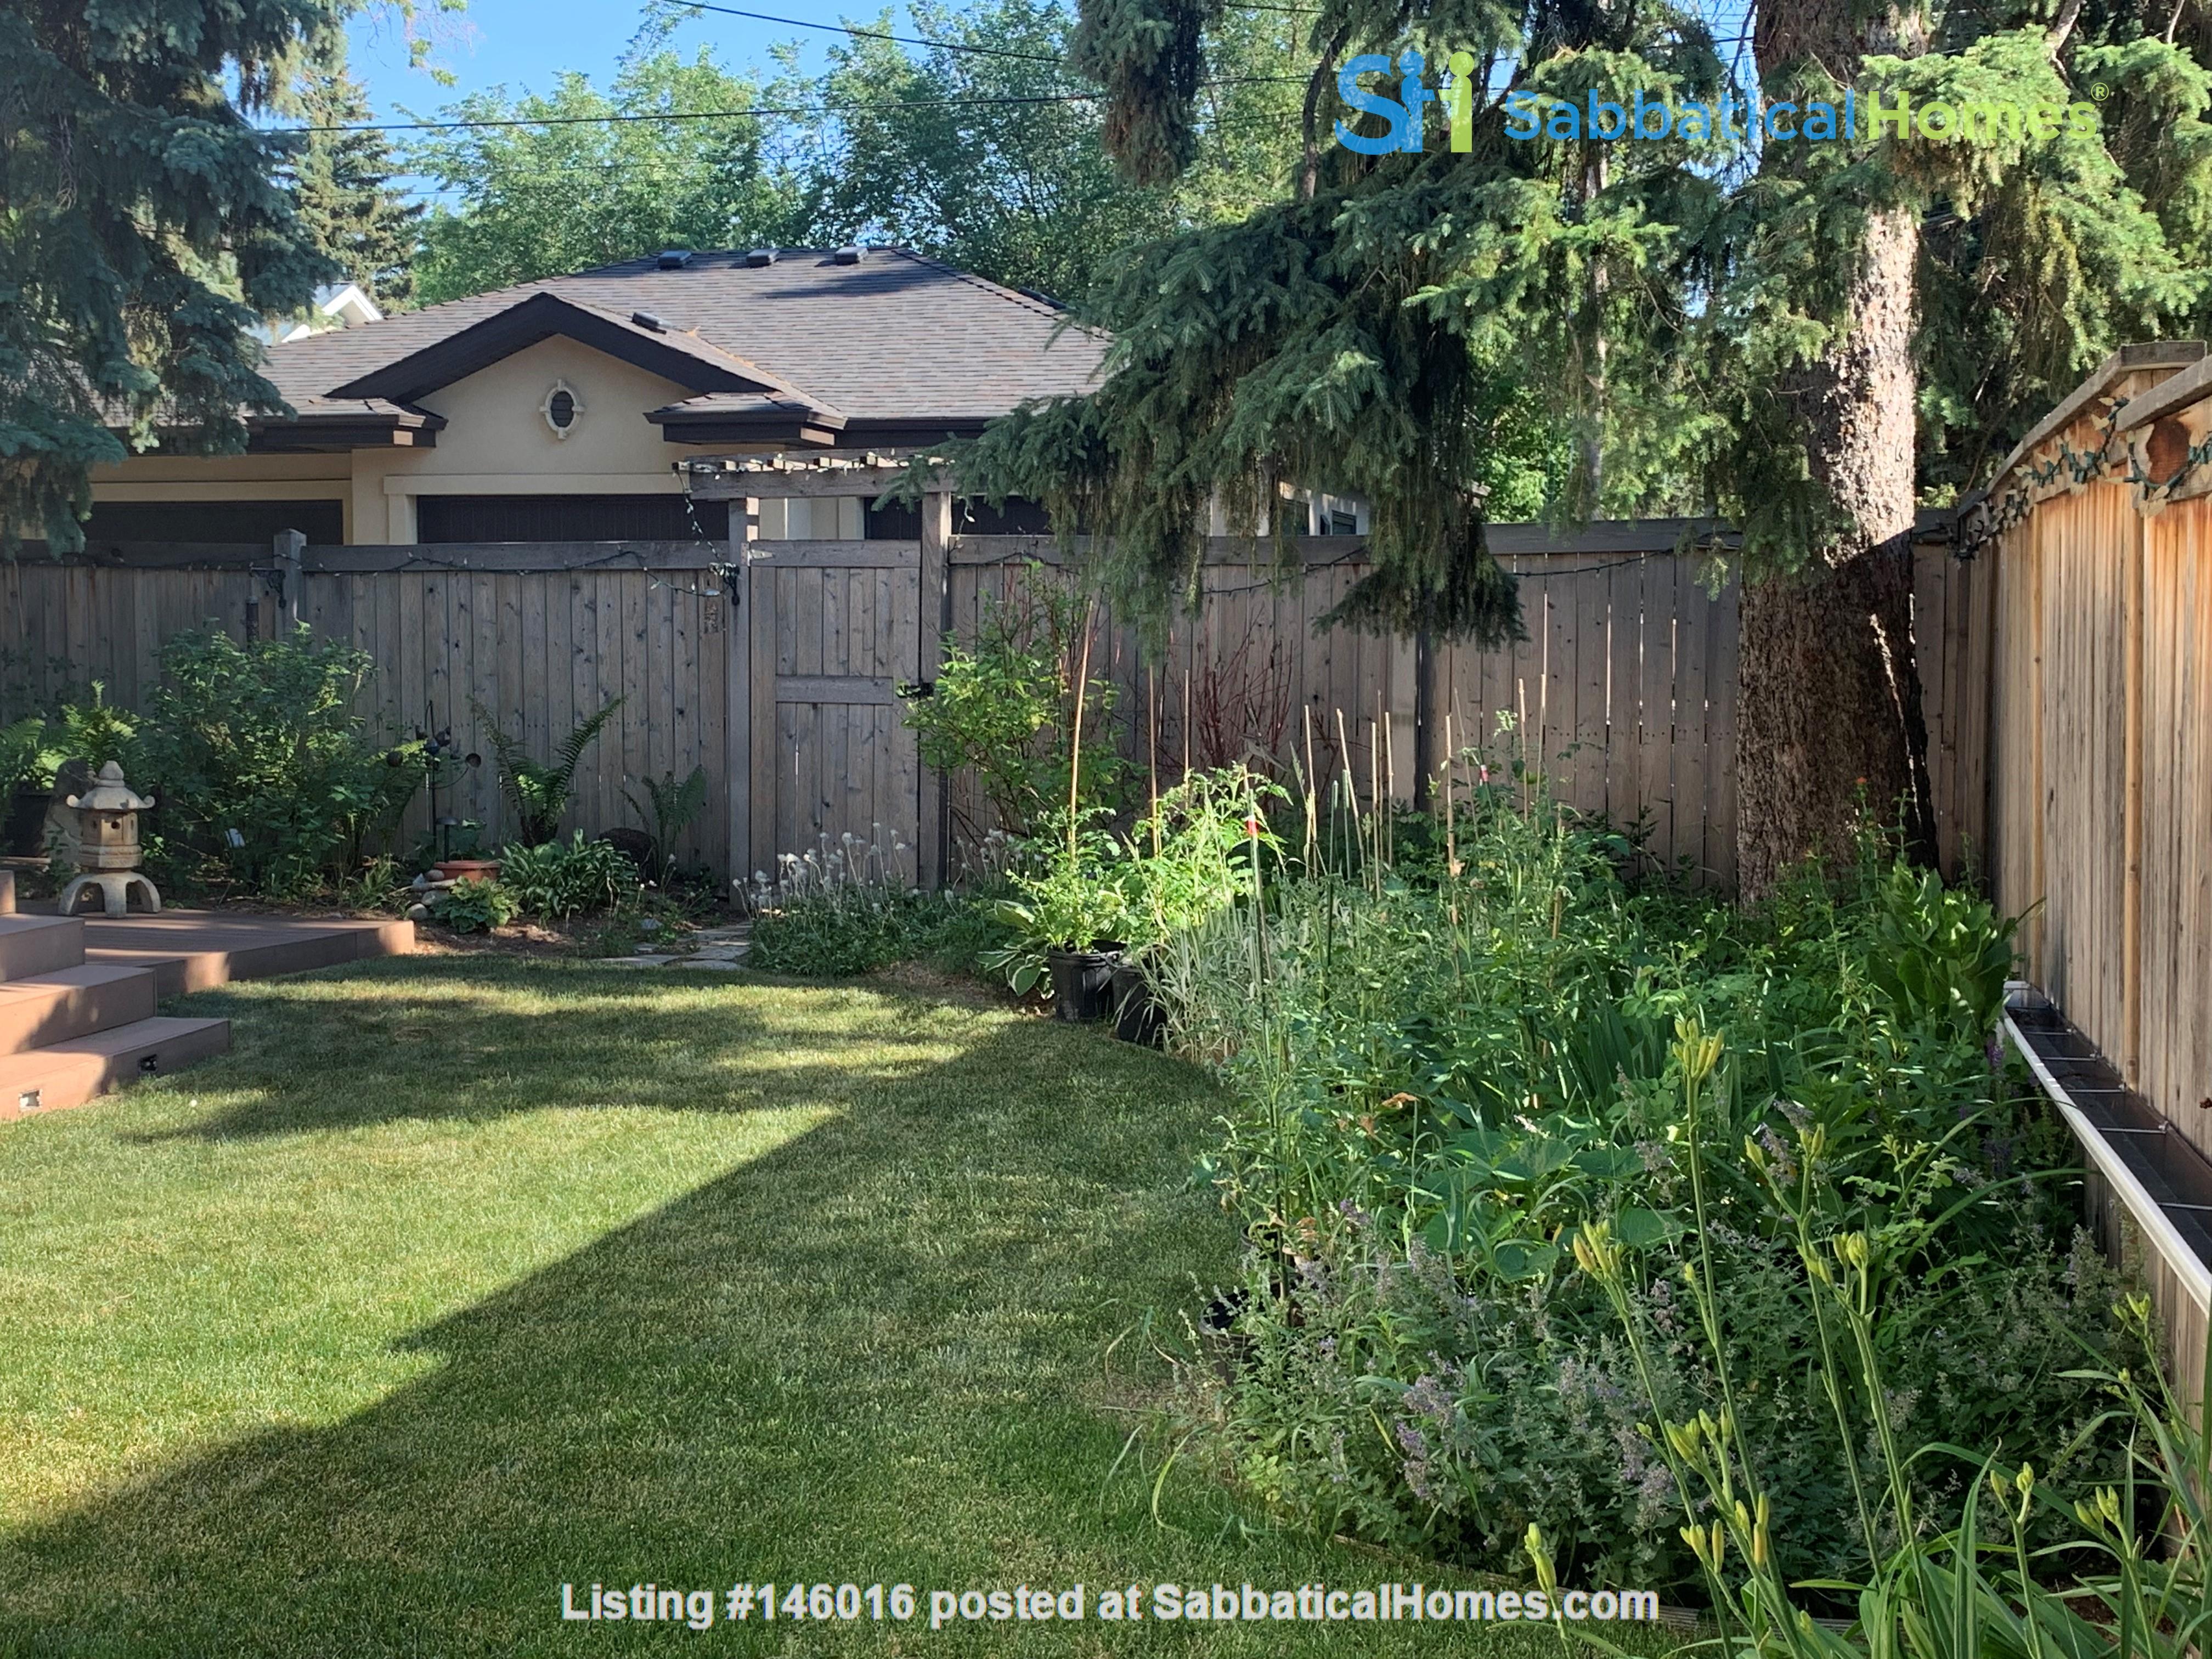 Forest haven sabbatical home Home Rental in Edmonton 2